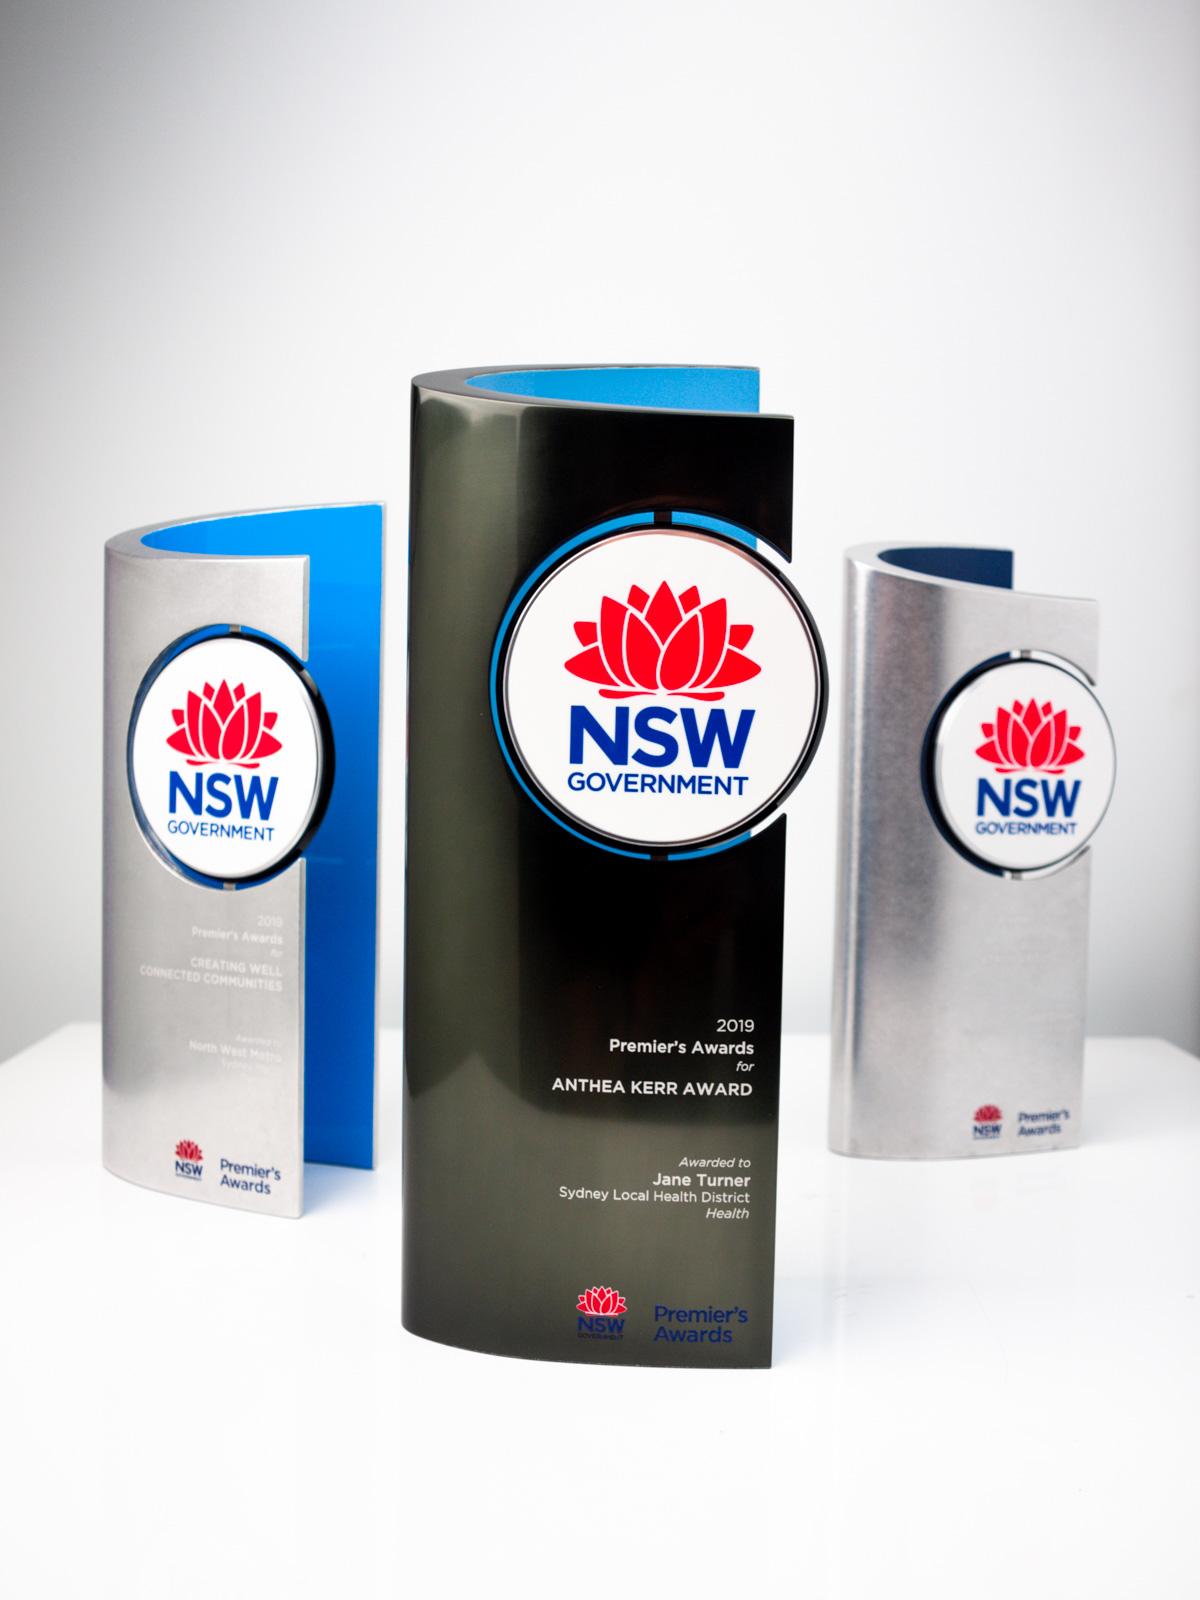 NSW Premier's Awards